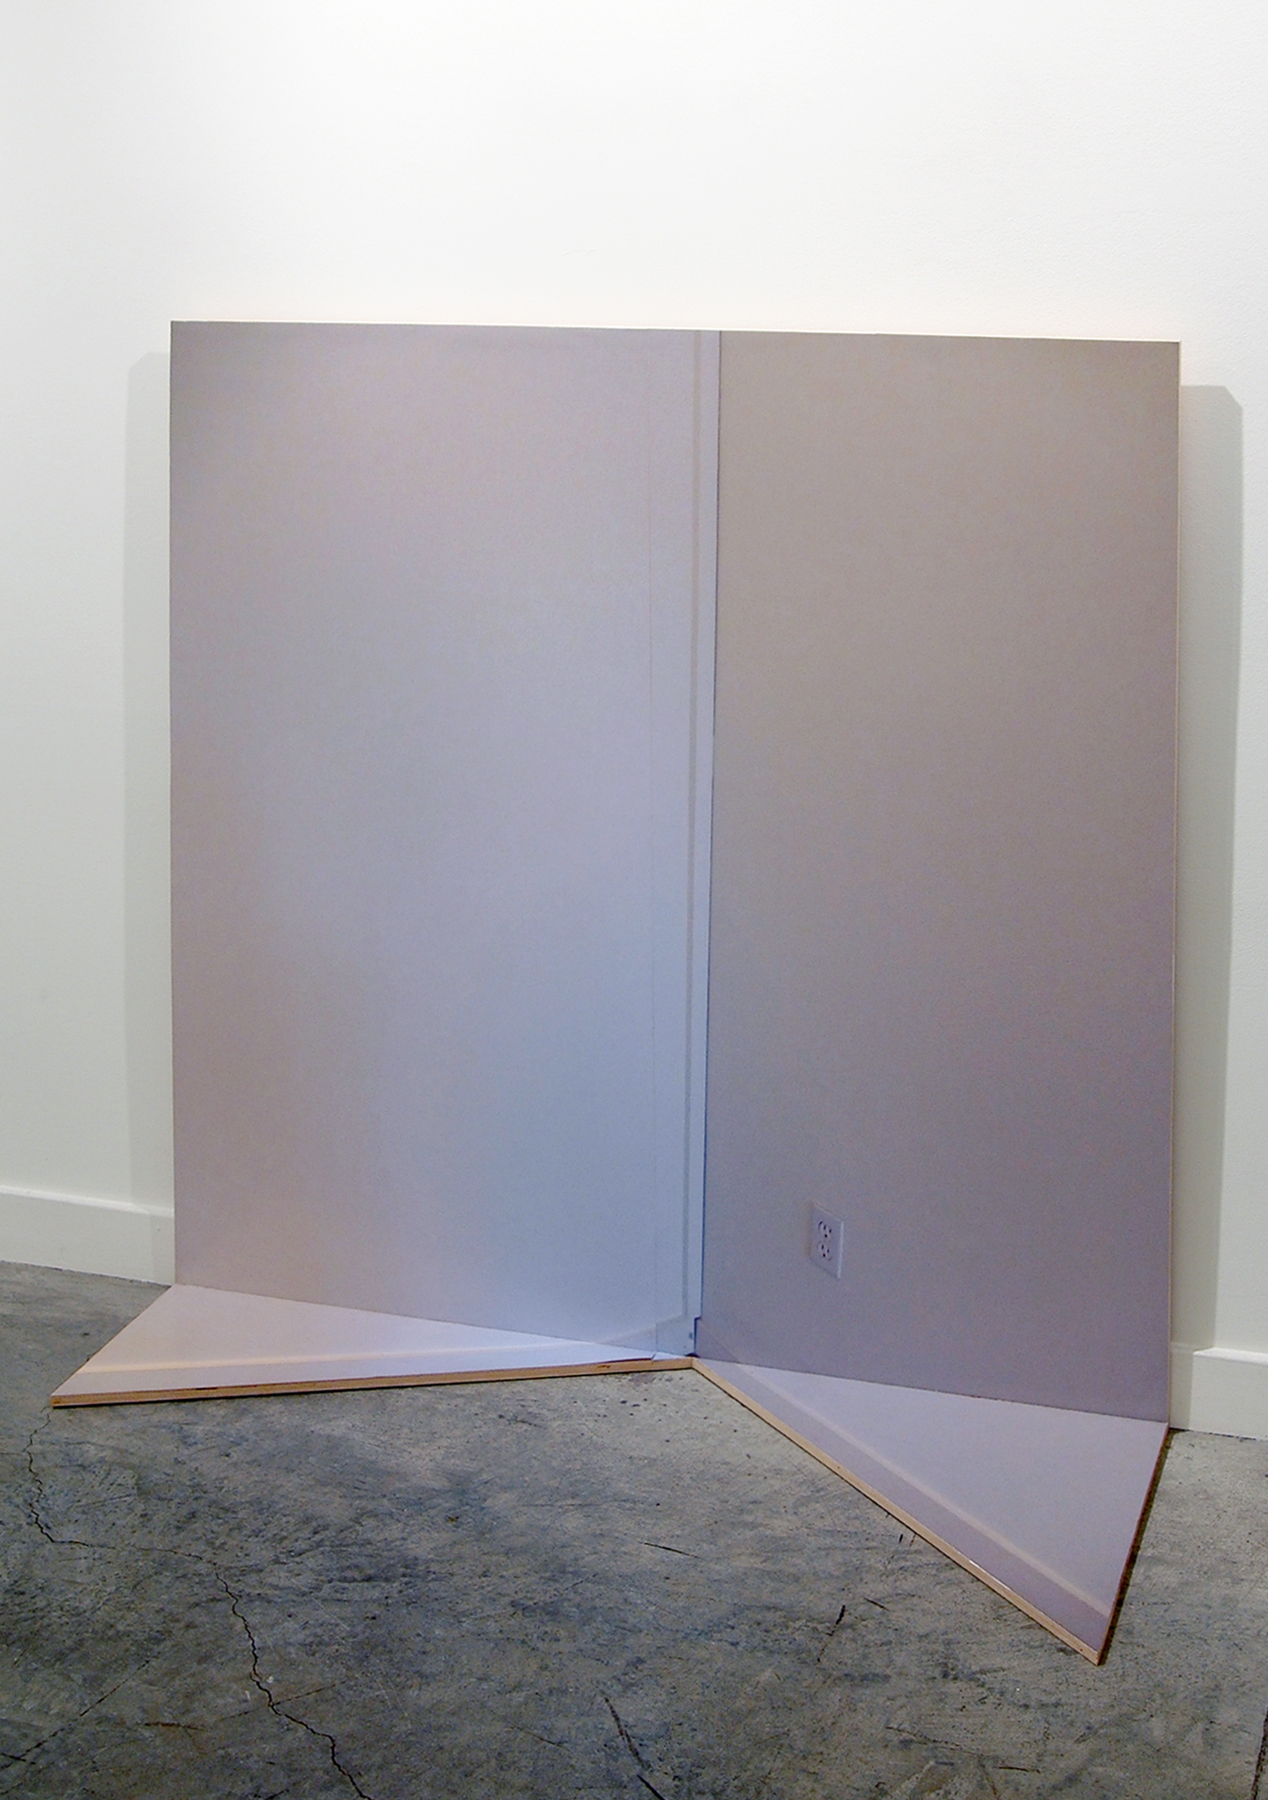 "WITH CINDER BLOCKS WE FLATTEN OUR PHOTOGRAPHS  Emma Spertus, Corner , ink jet print on plywood, 44"" x 44"" x 16.25"", 2013"